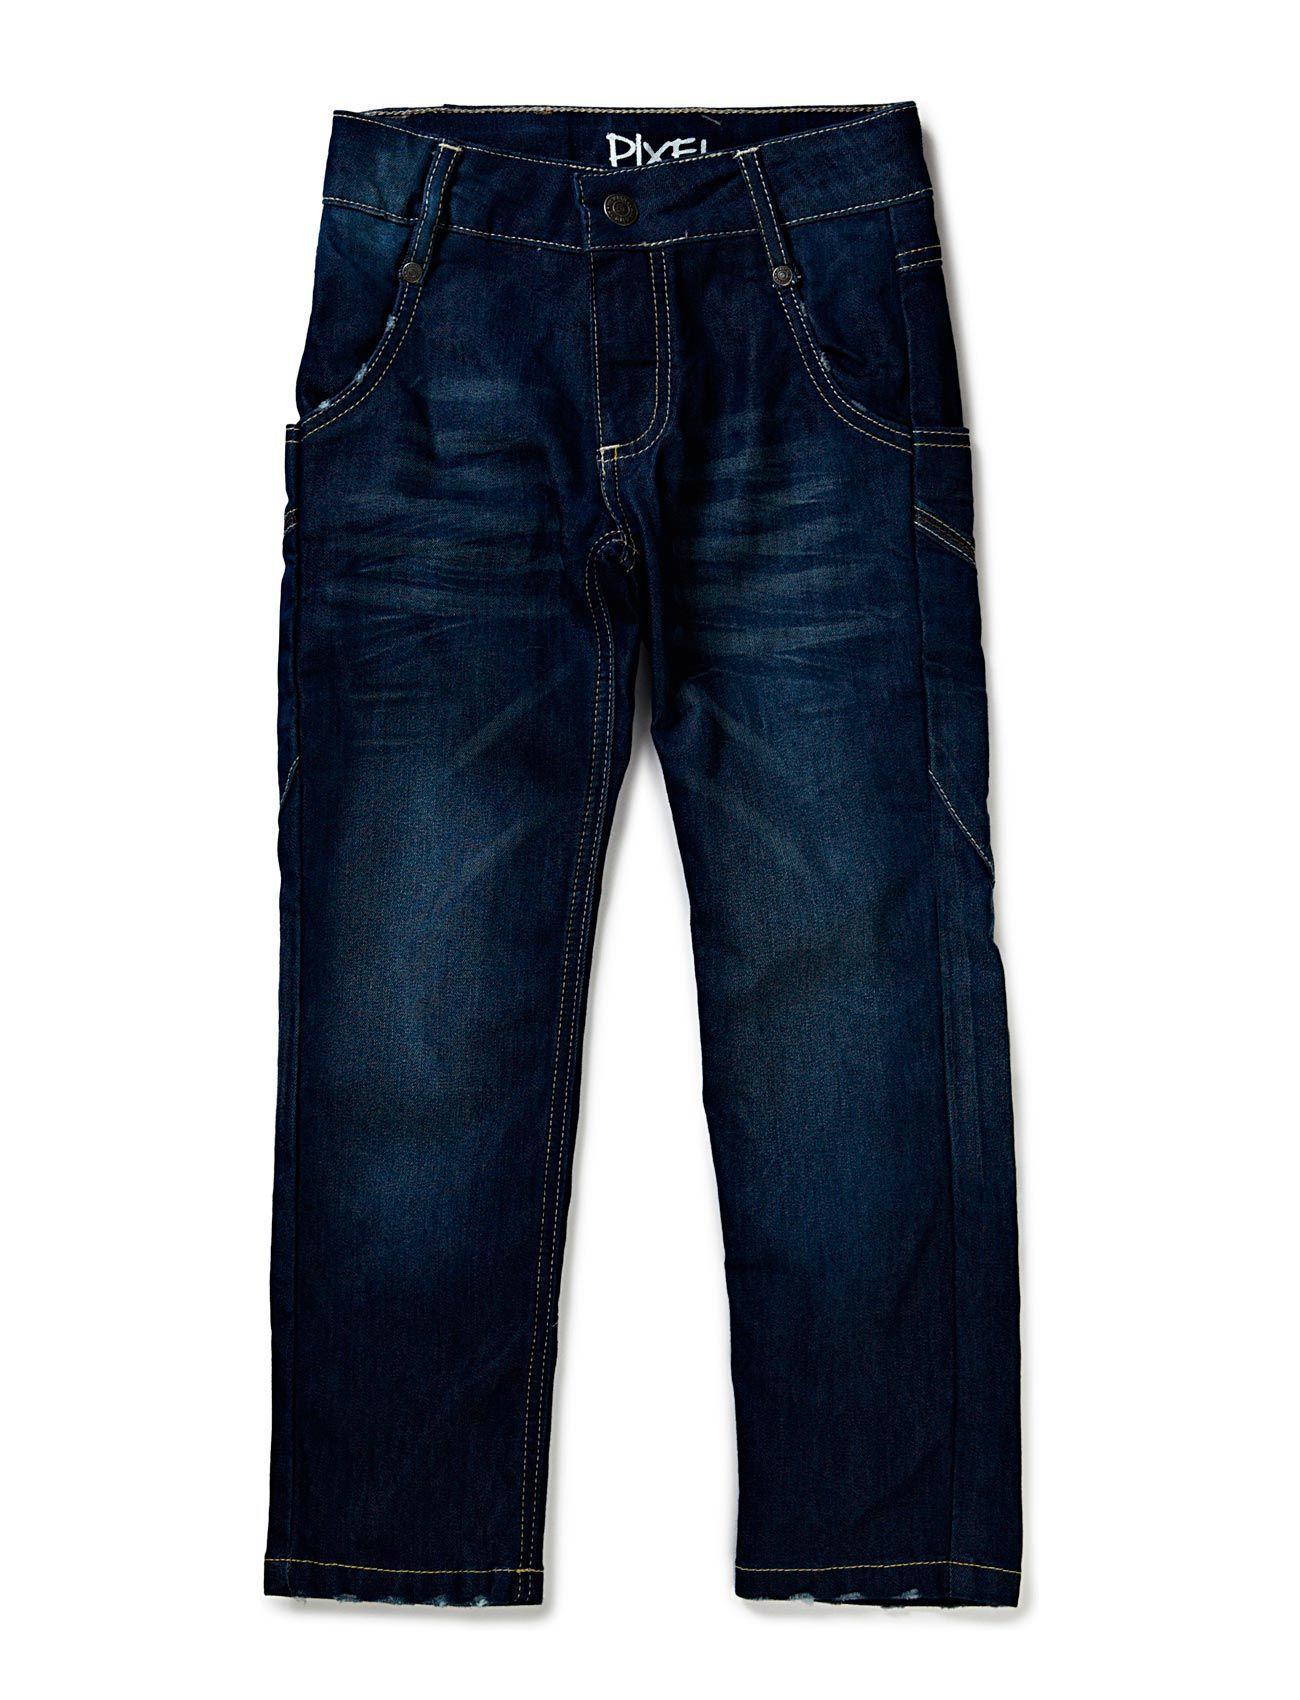 Pixel Jeans